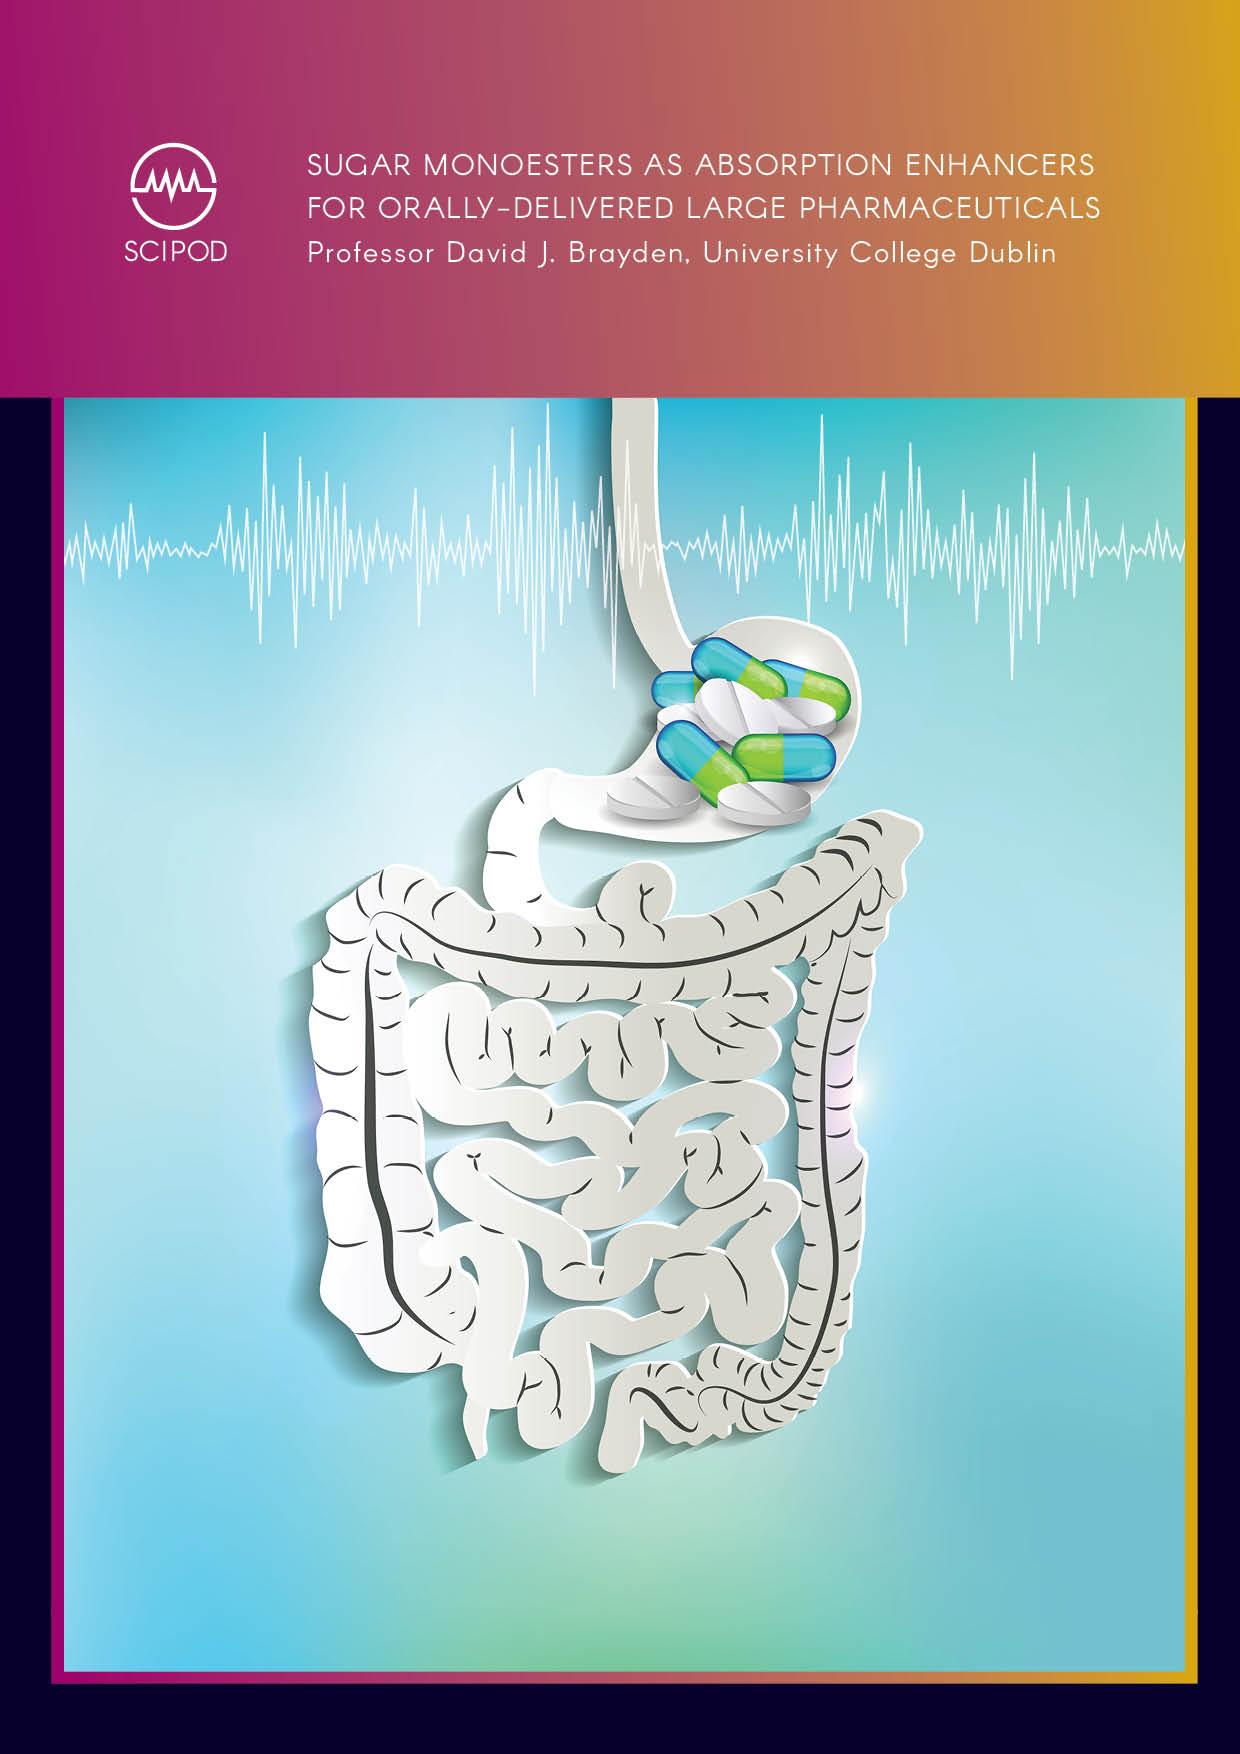 Sugar Monoesters as Absorption Enhancers for Orally-Delivered Large Pharmaceuticals – Professor David J. Brayden, University College Dublin